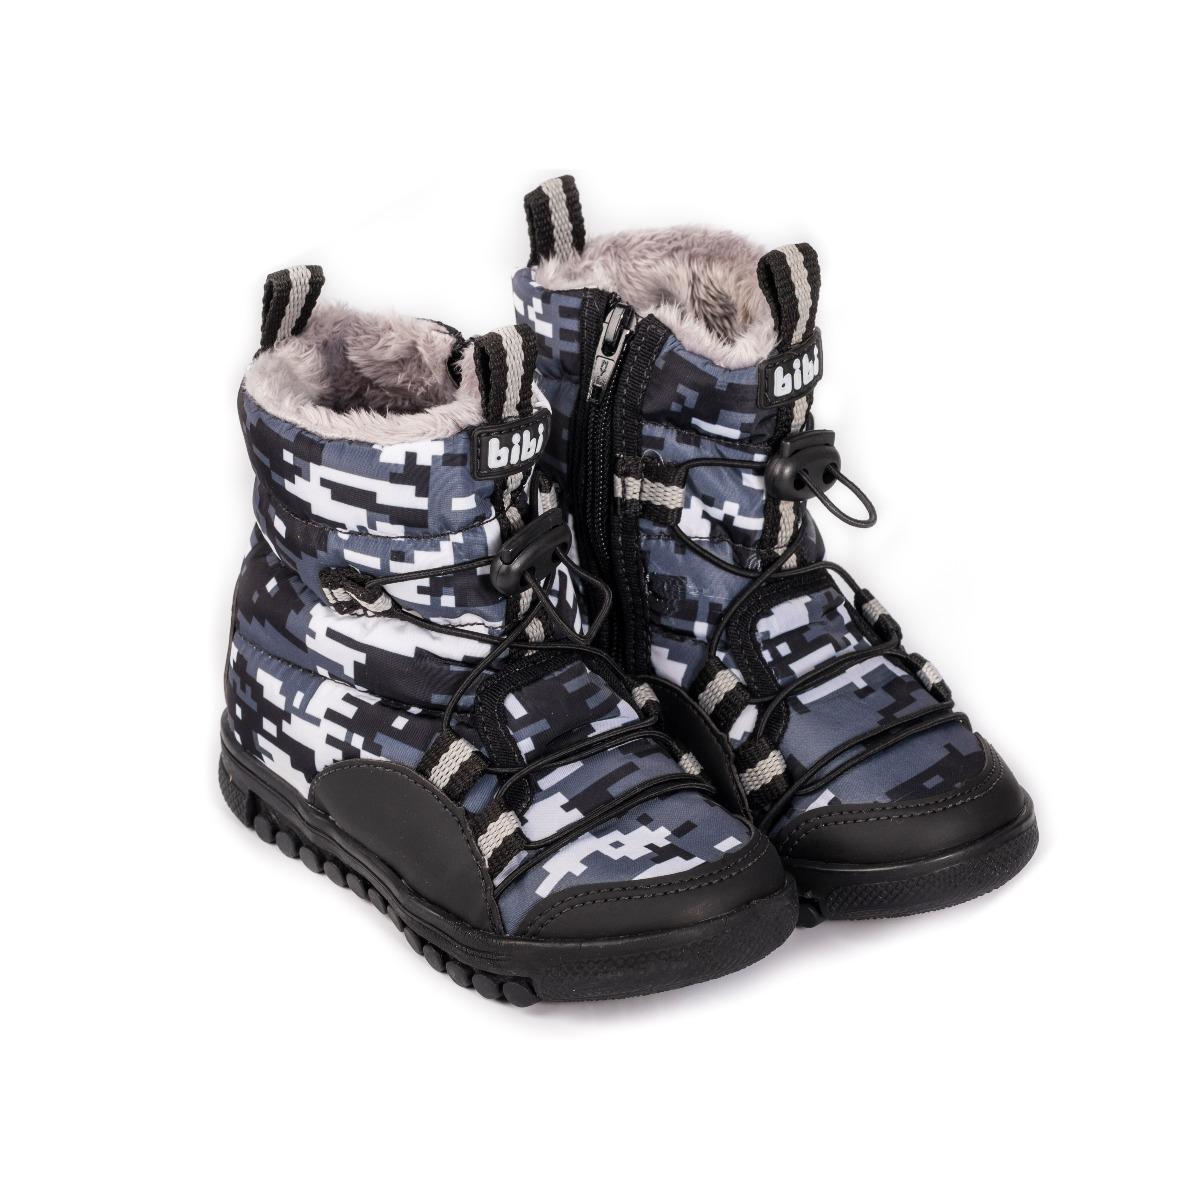 Cizme cu blanita Bibi Shoes Roller Camuflaj imagine